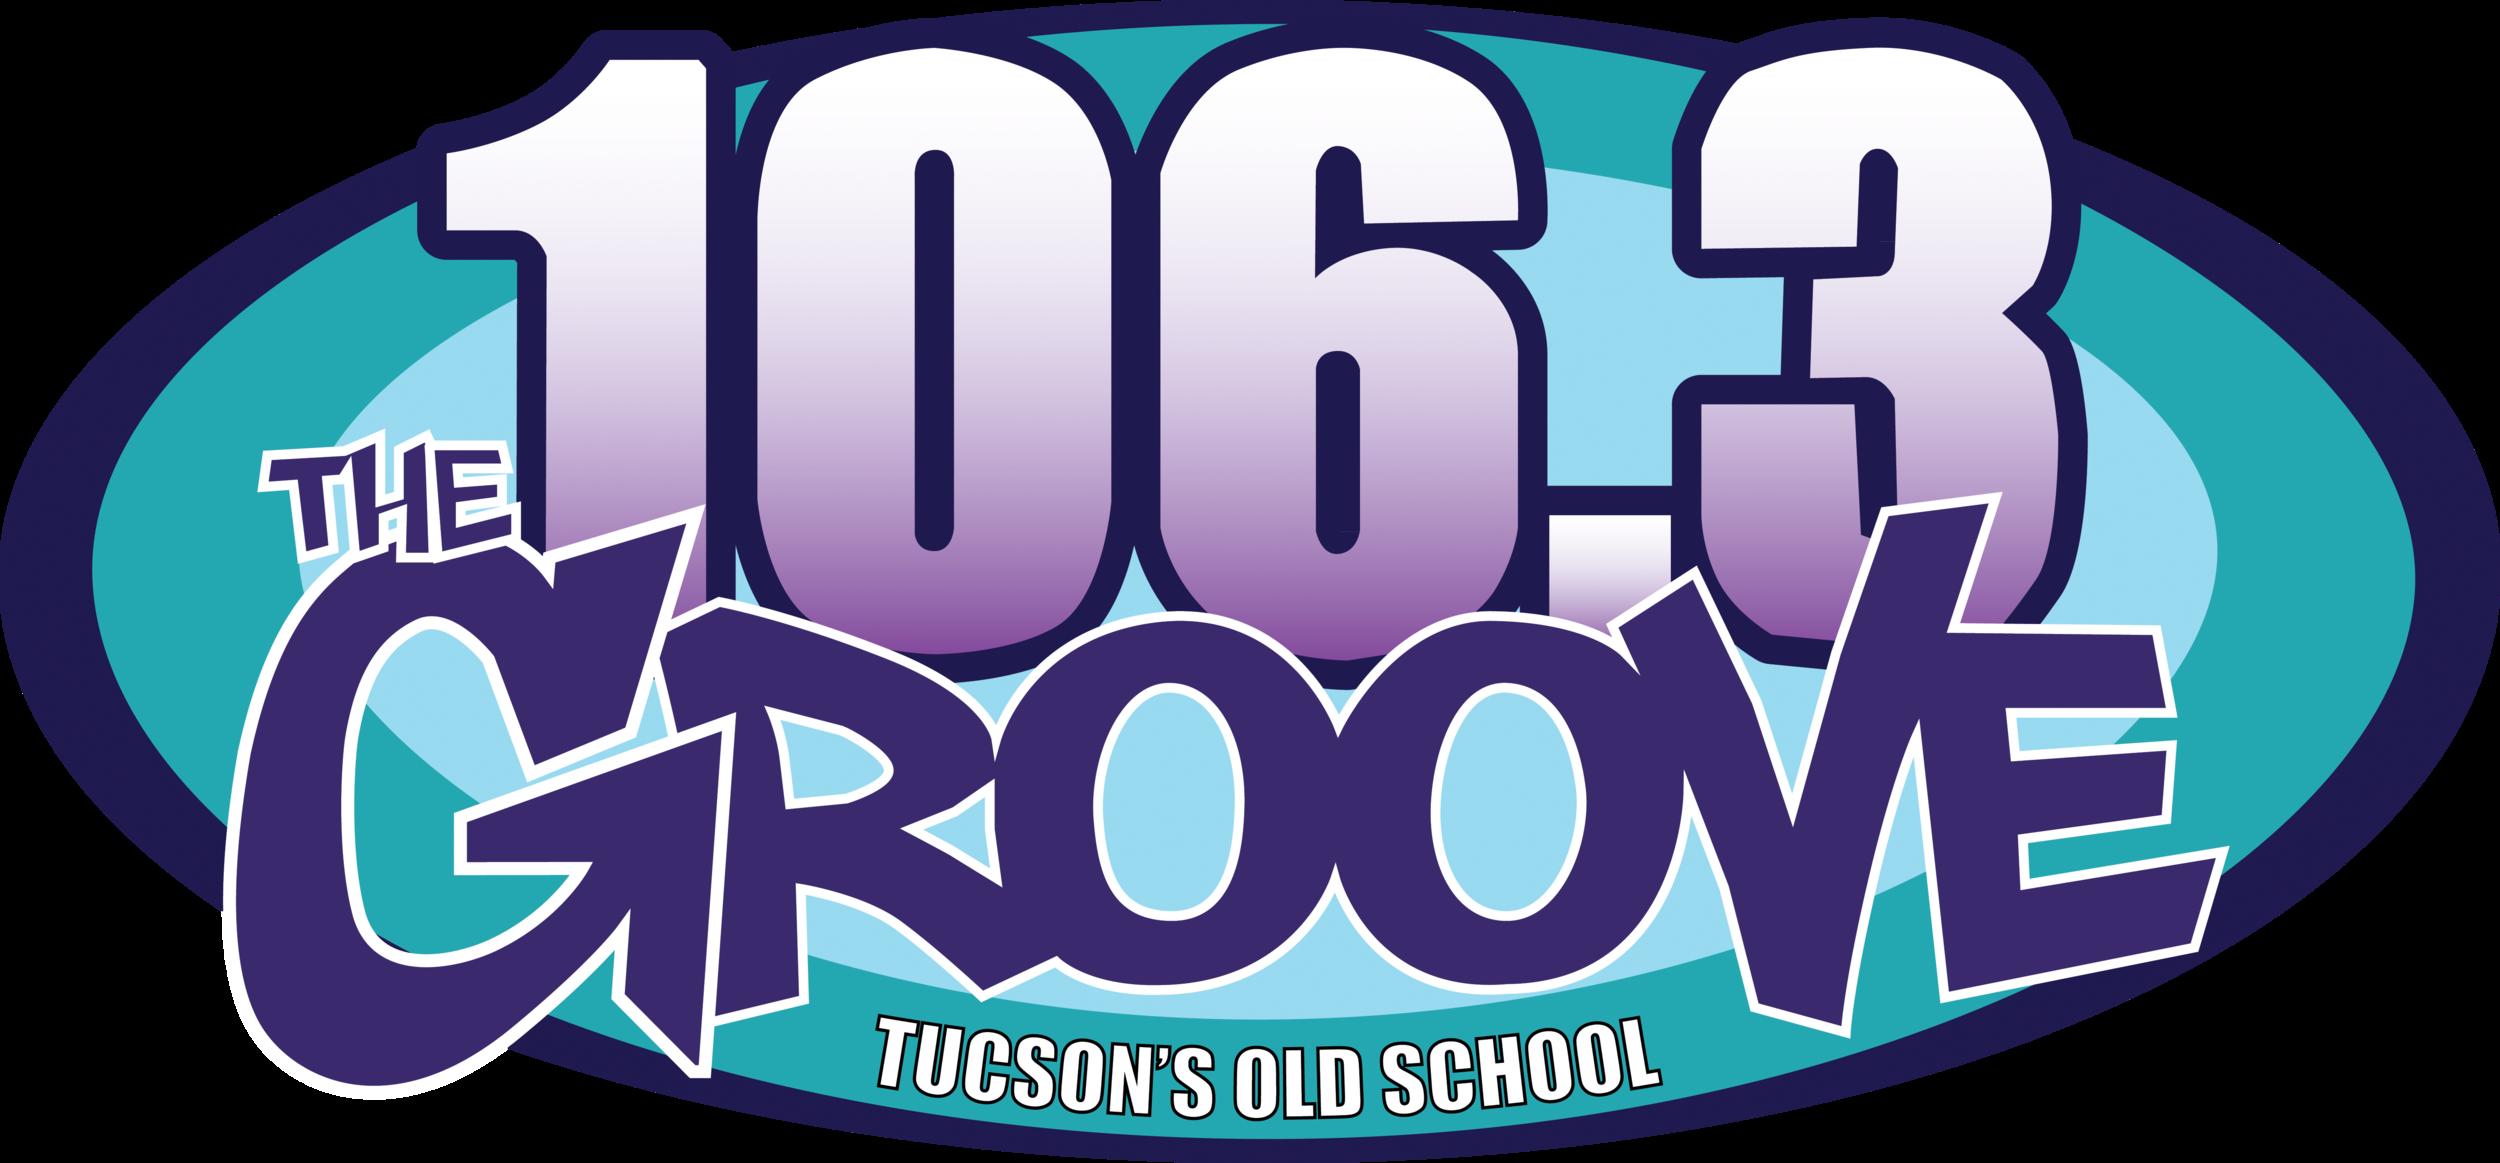 KTGV 106.3 Tucson.png